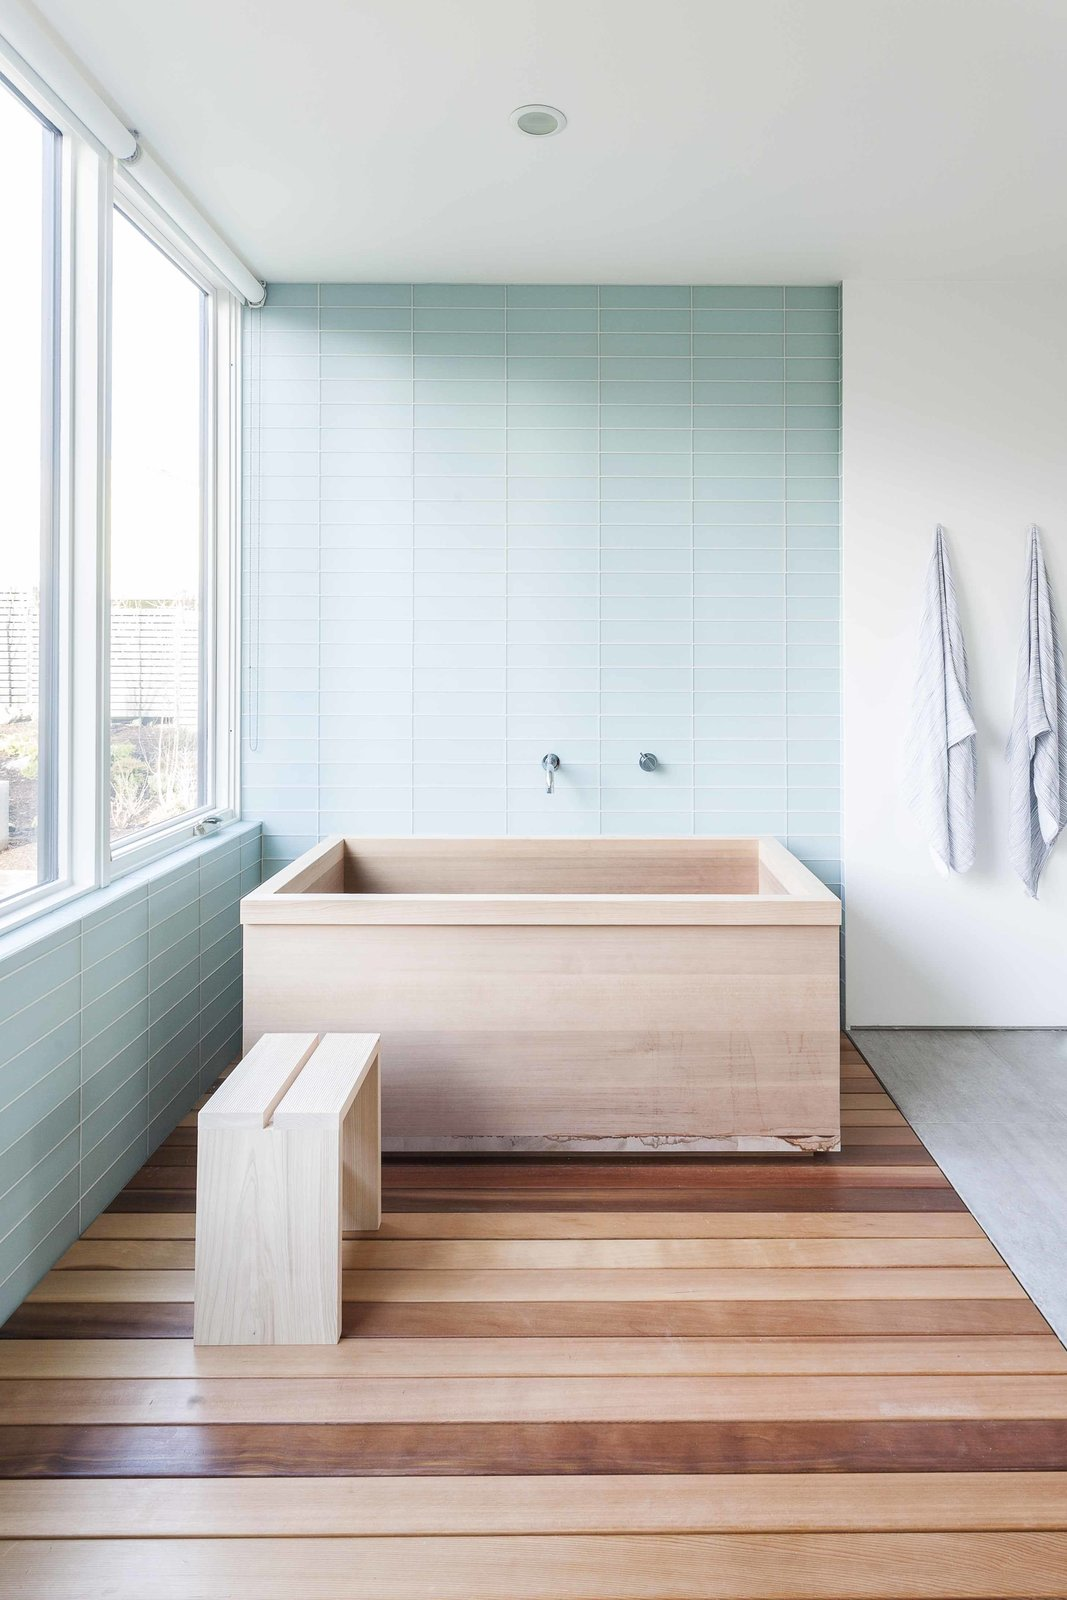 Minimalist bathroom | Source: dwell.com